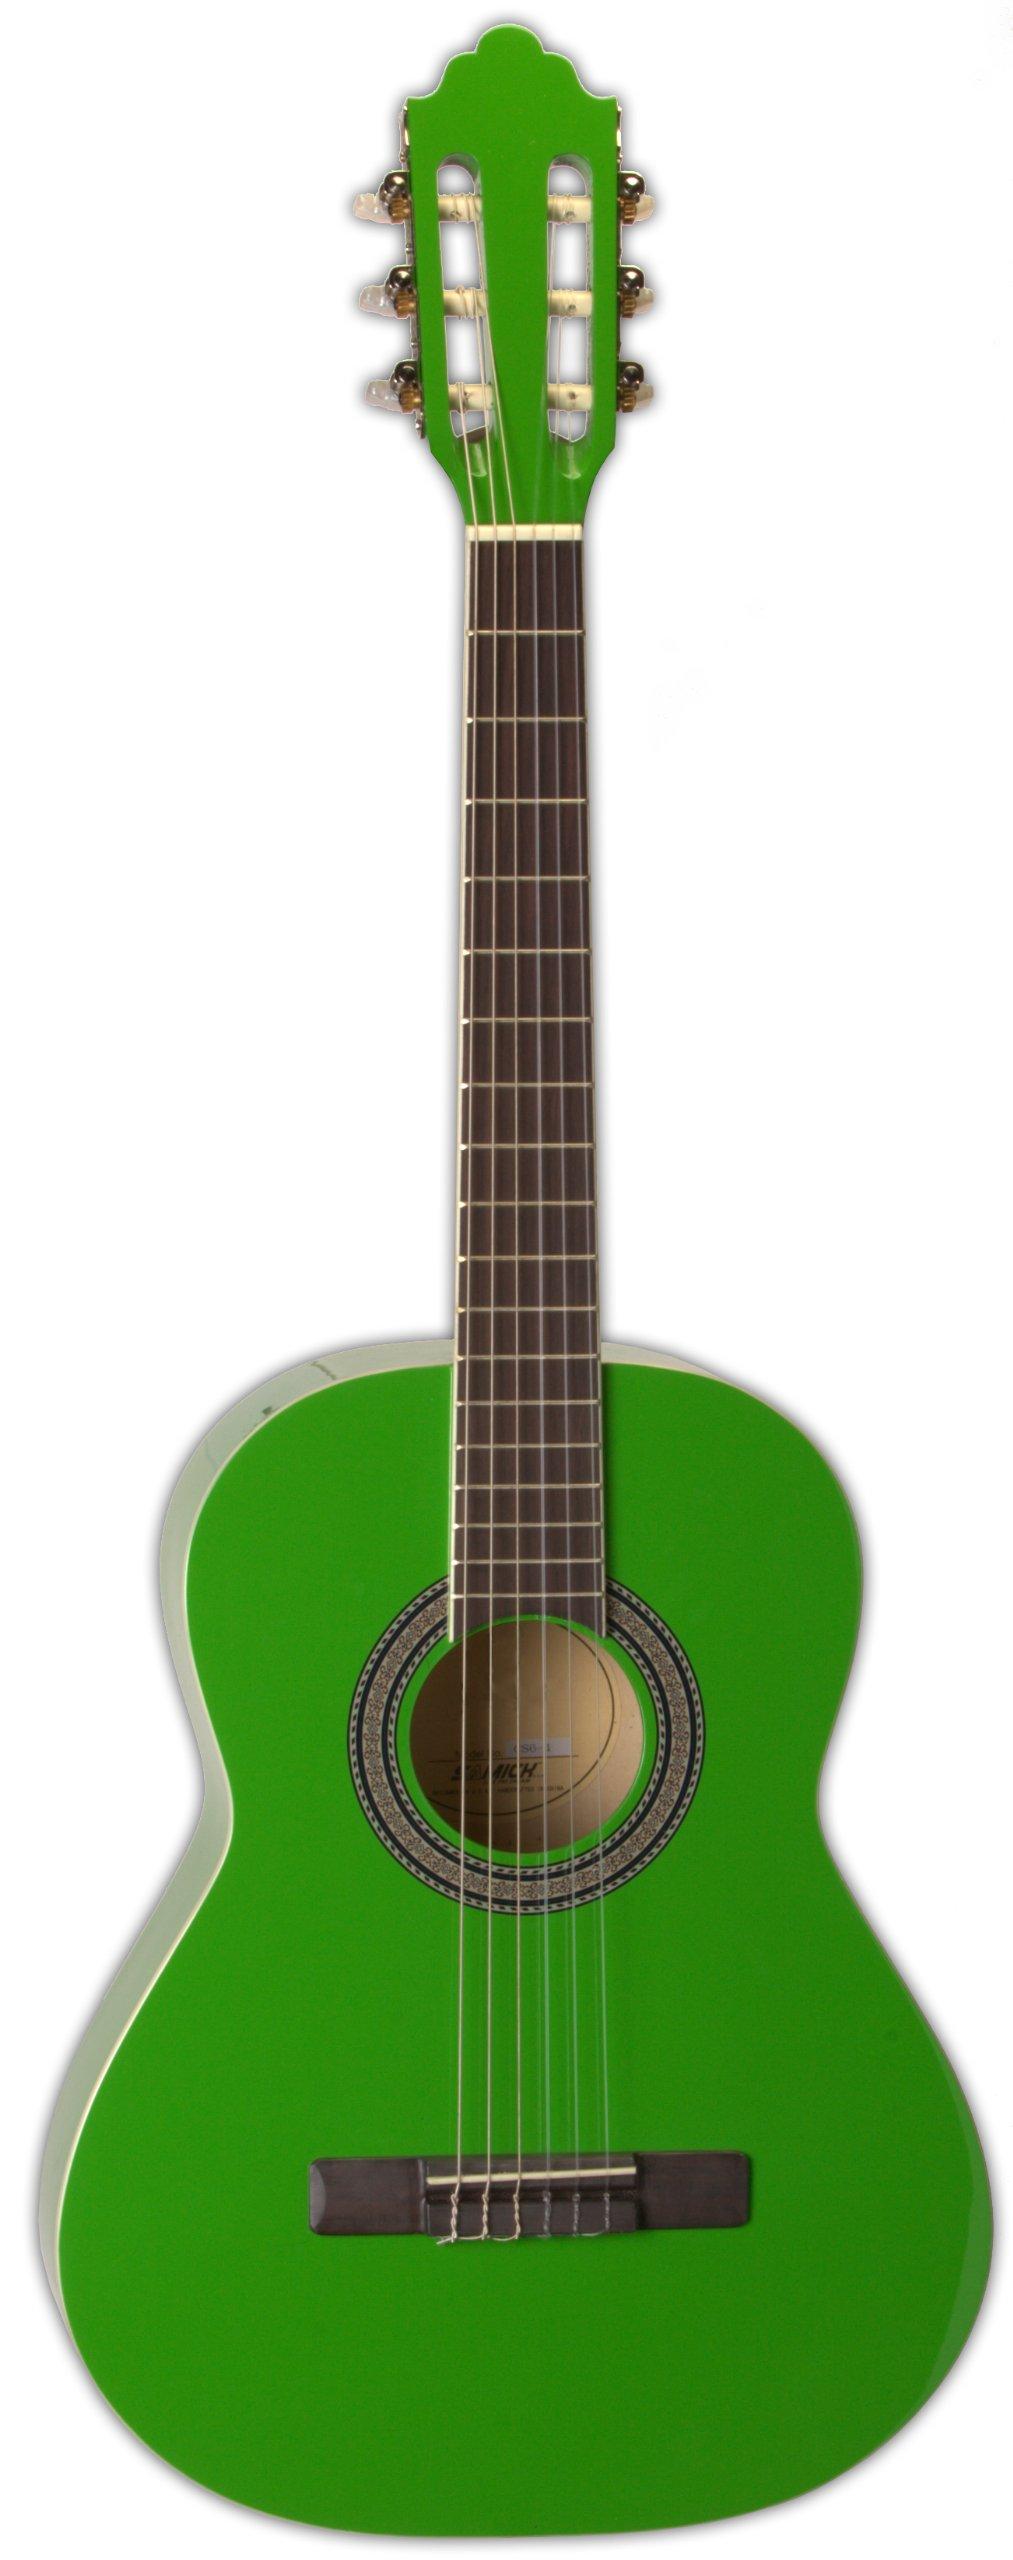 San Mateo San Mateo SCS6 GRN 36-Inch Classical Guitar, Green by San Mateo (Image #1)